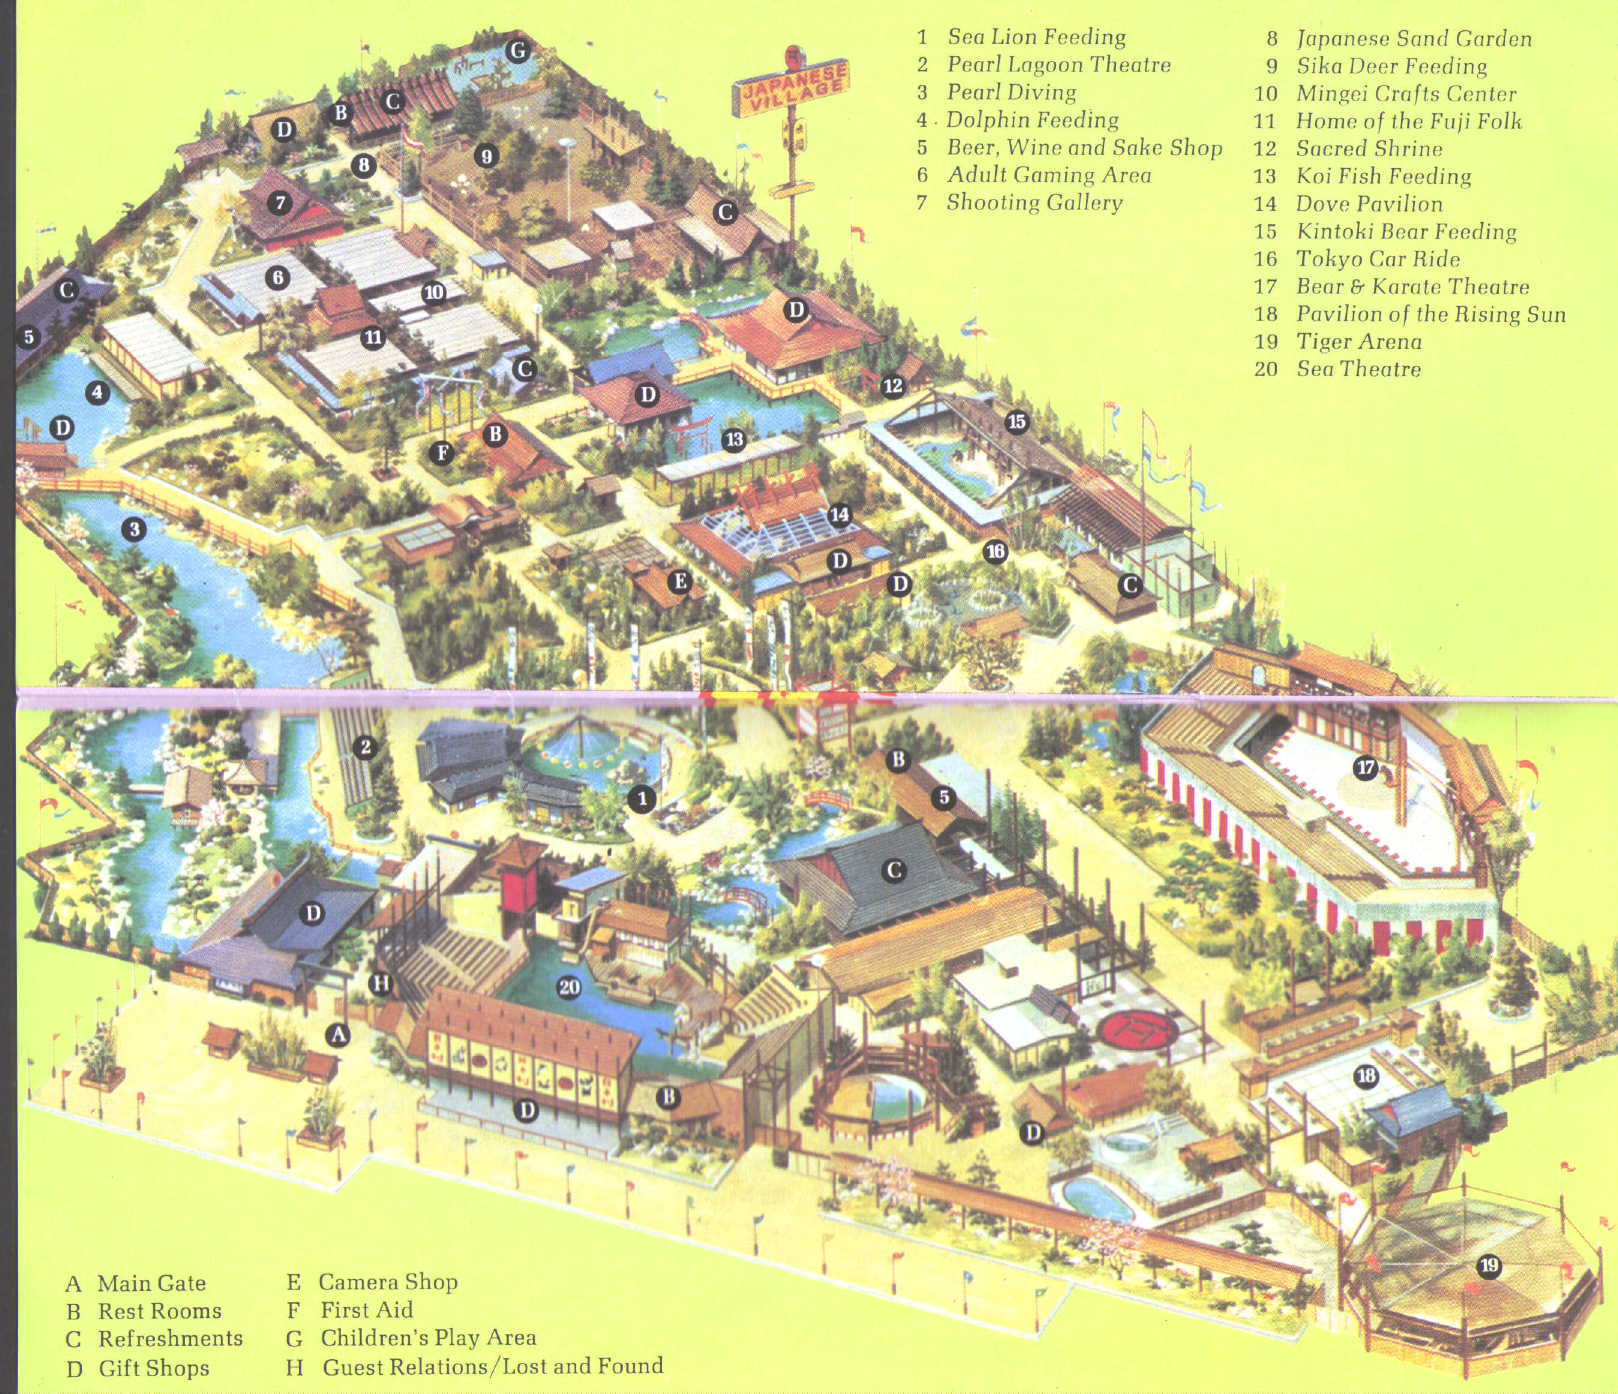 buena park Buena park metroplex 18 8290 la palma ave buena park, ca 90620 showtimes: (714)826-7469 email: buenapark@kptmoviescom.